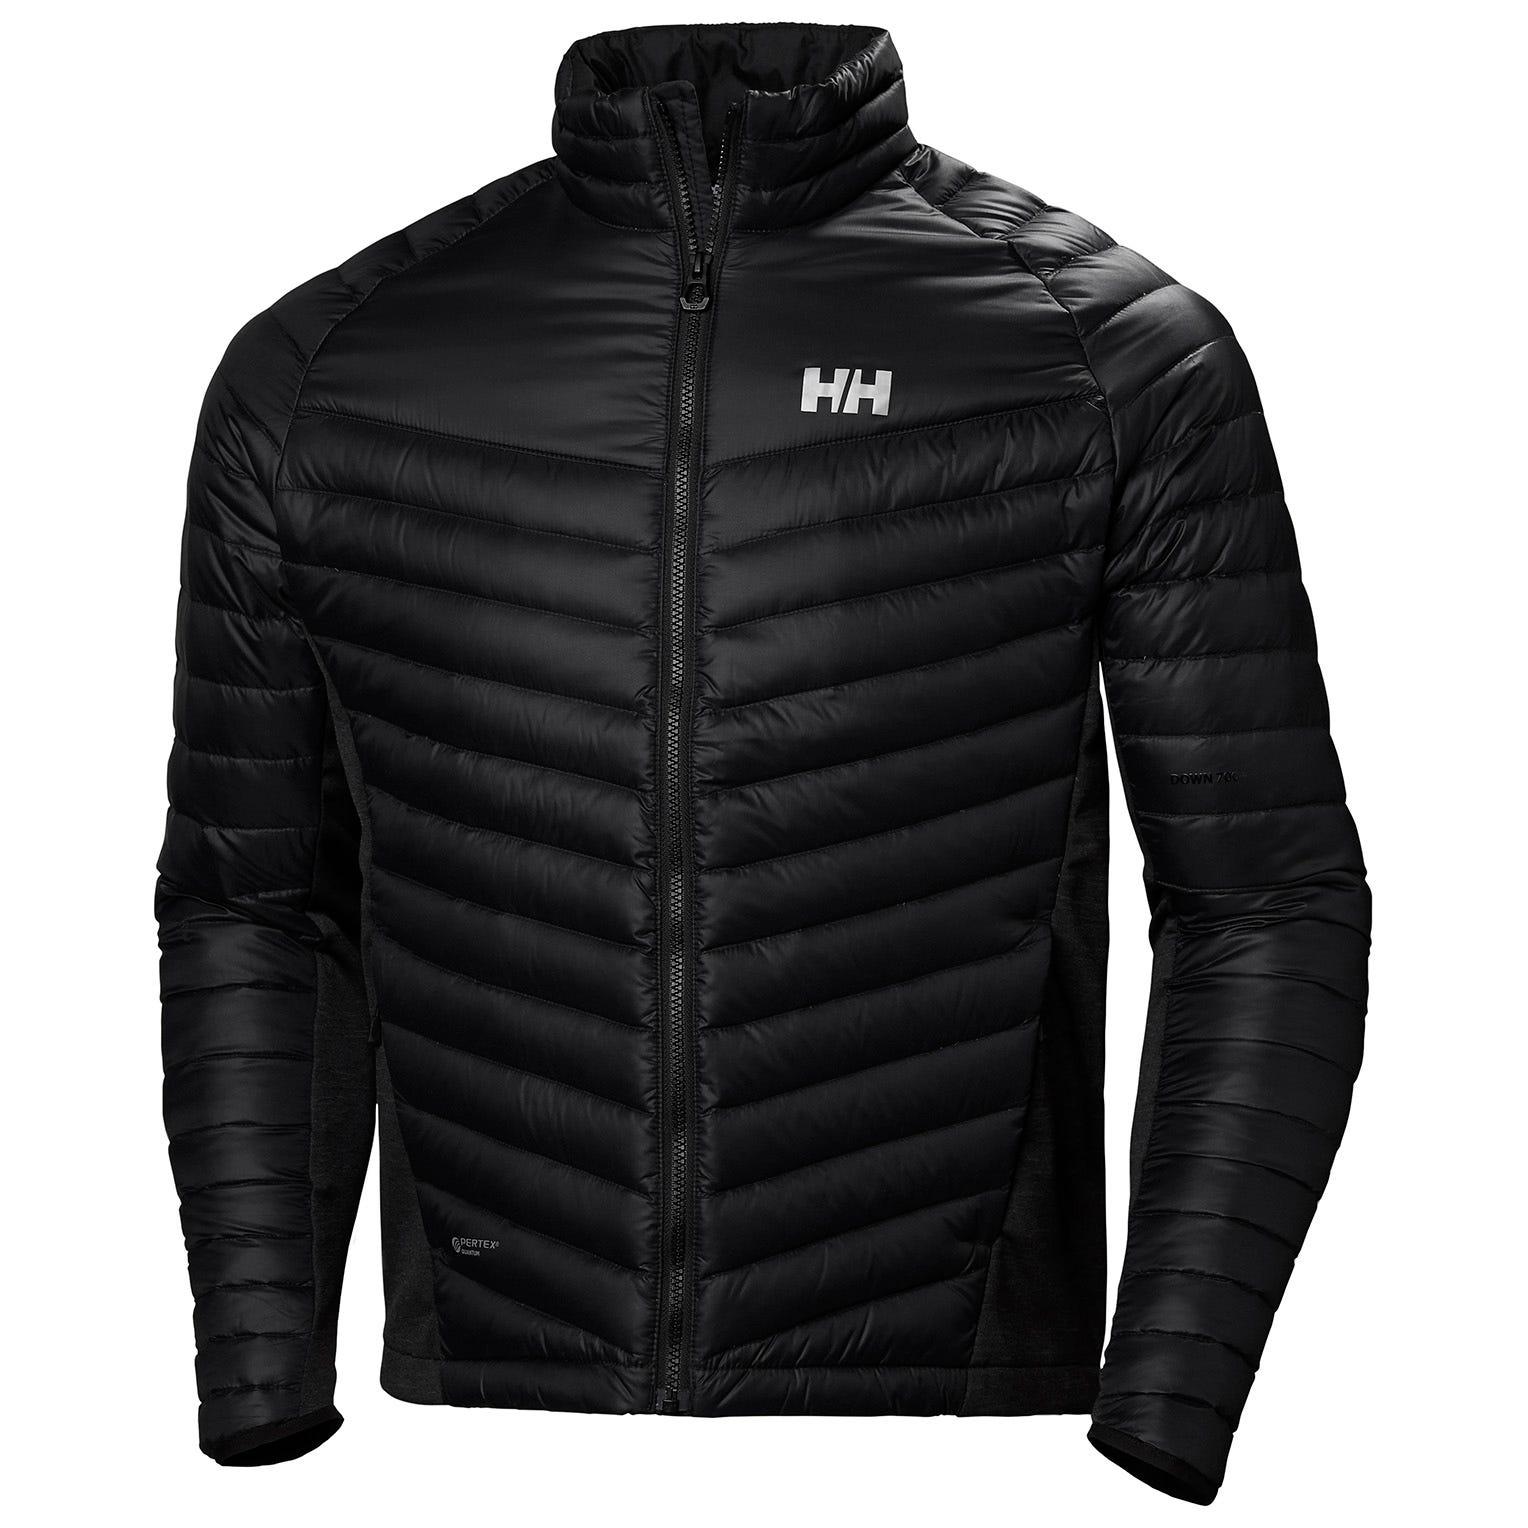 Helly Hansen Verglas Hybrid Insulator Mens Hiking Jacket Black XXL